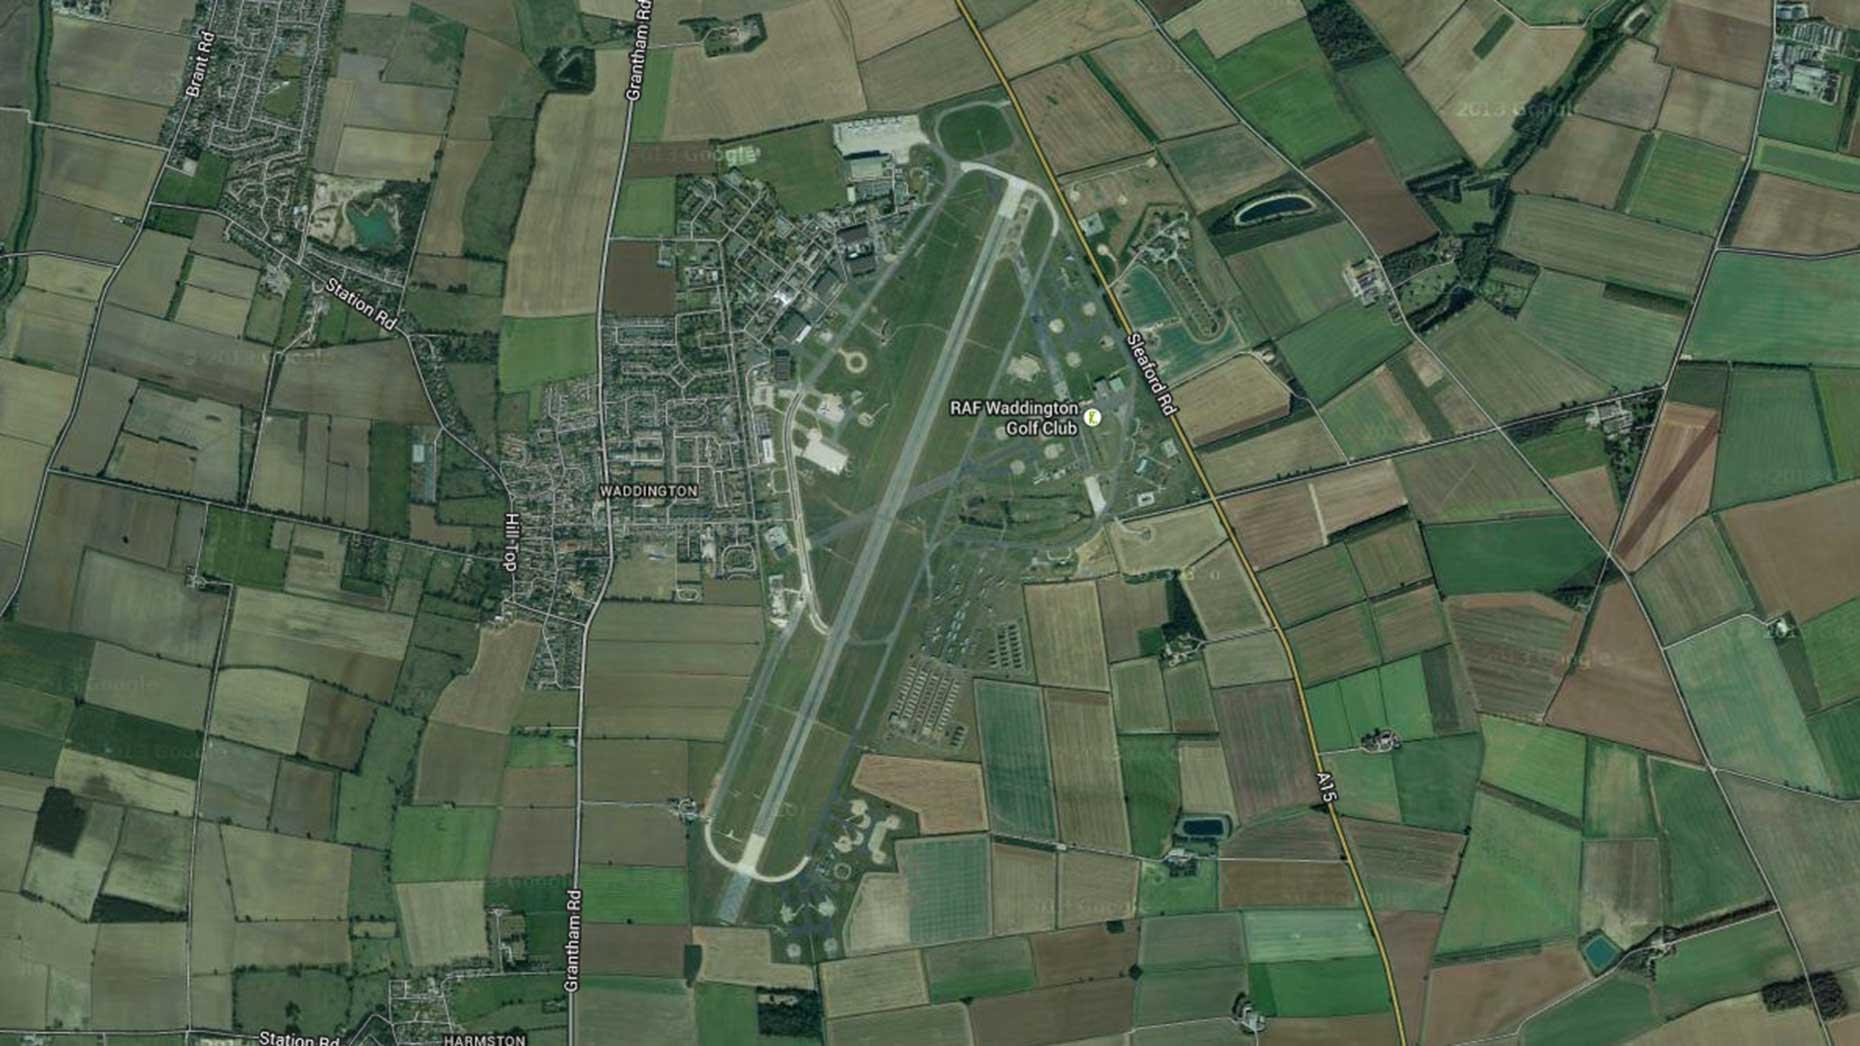 Satellite view of the RAF Waddington base near Lincoln. Image: Google Maps